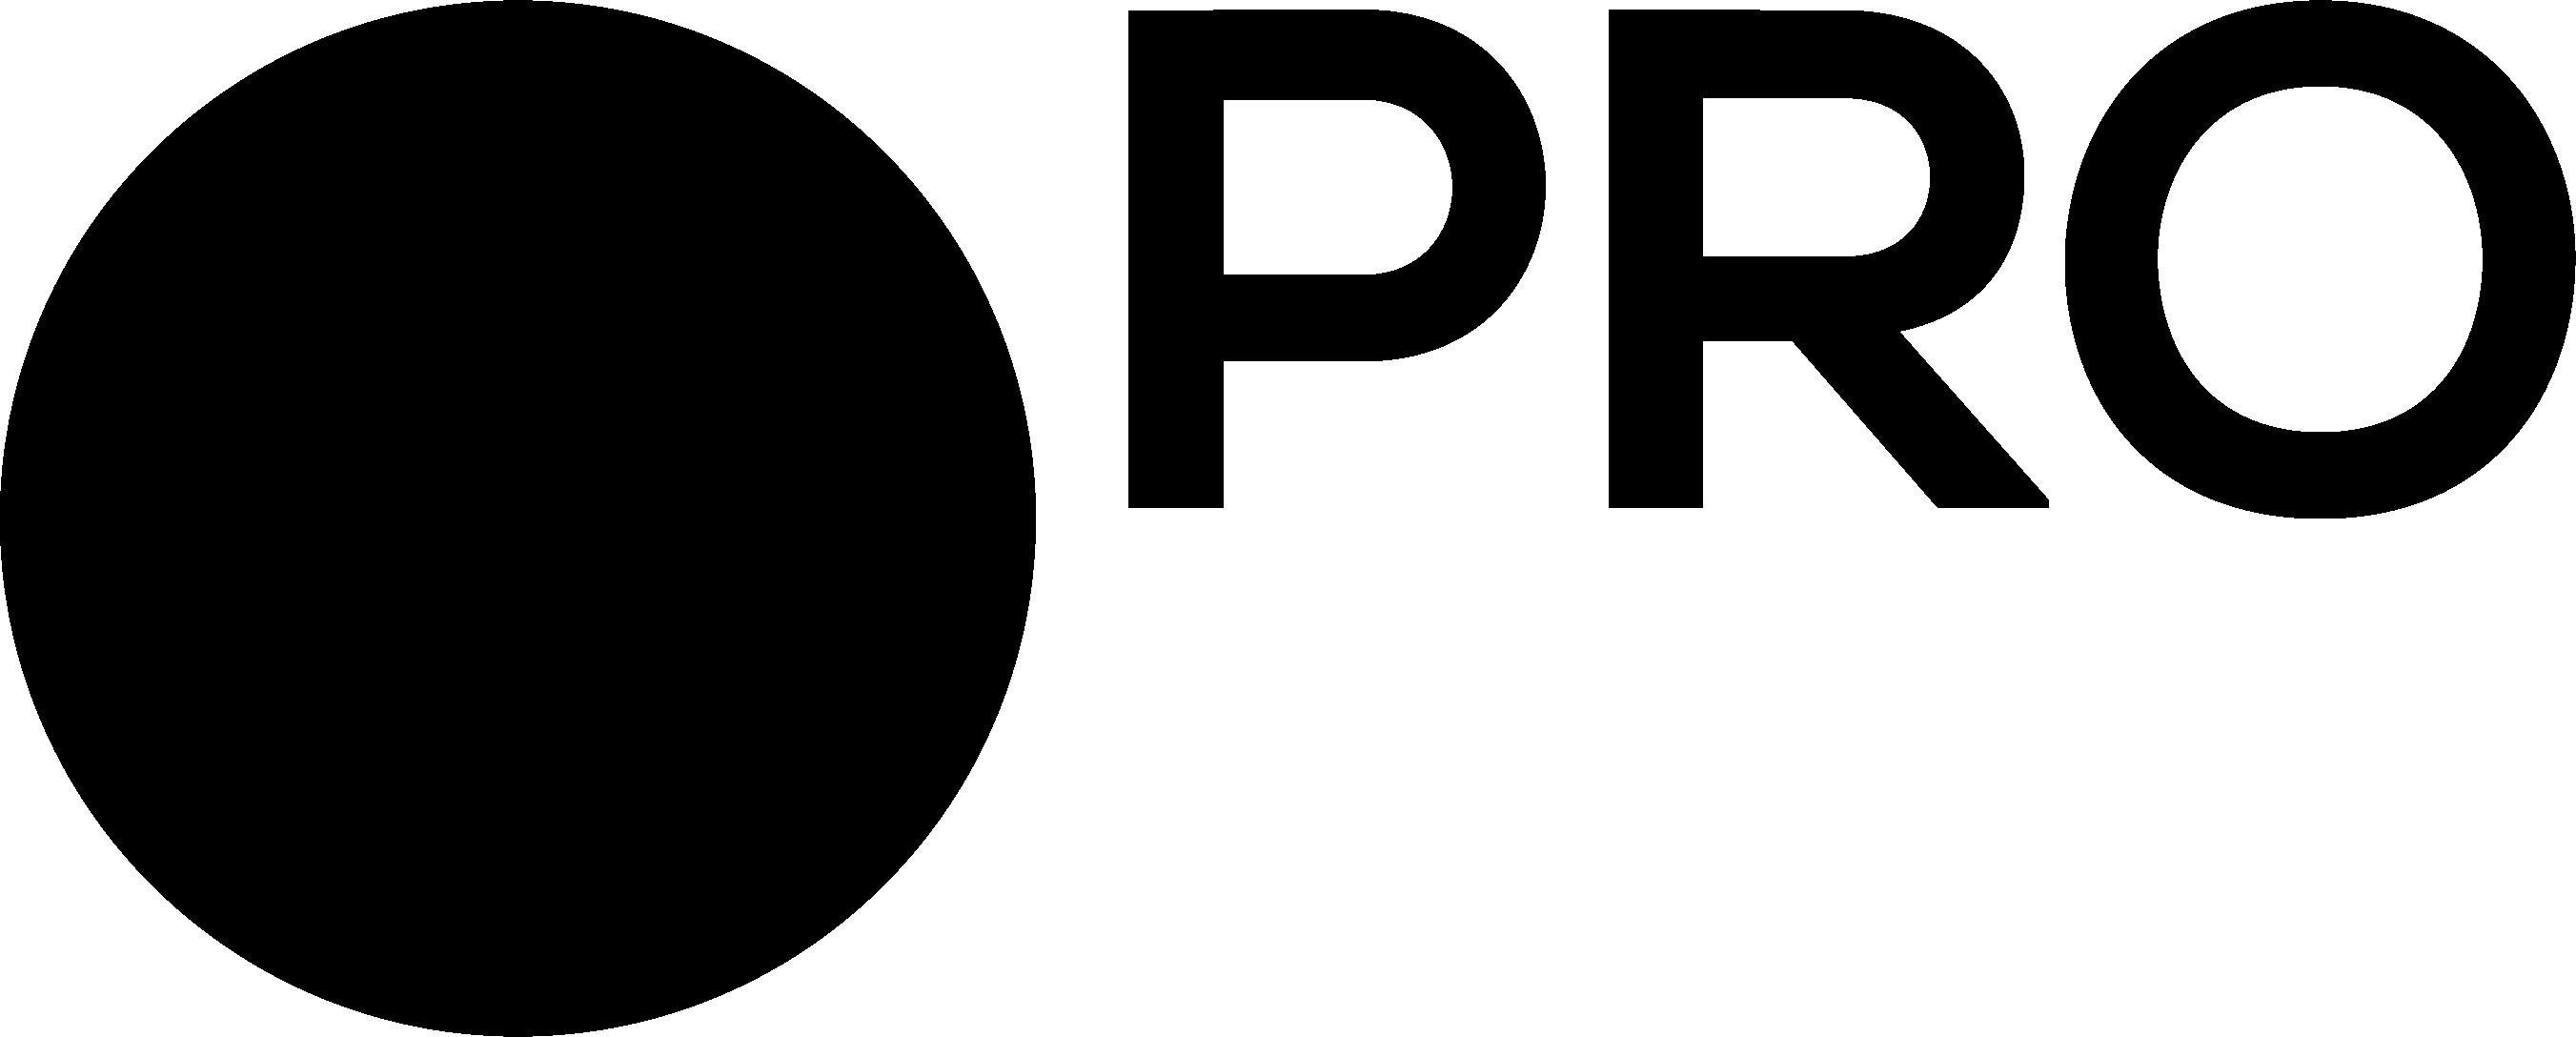 360PRO